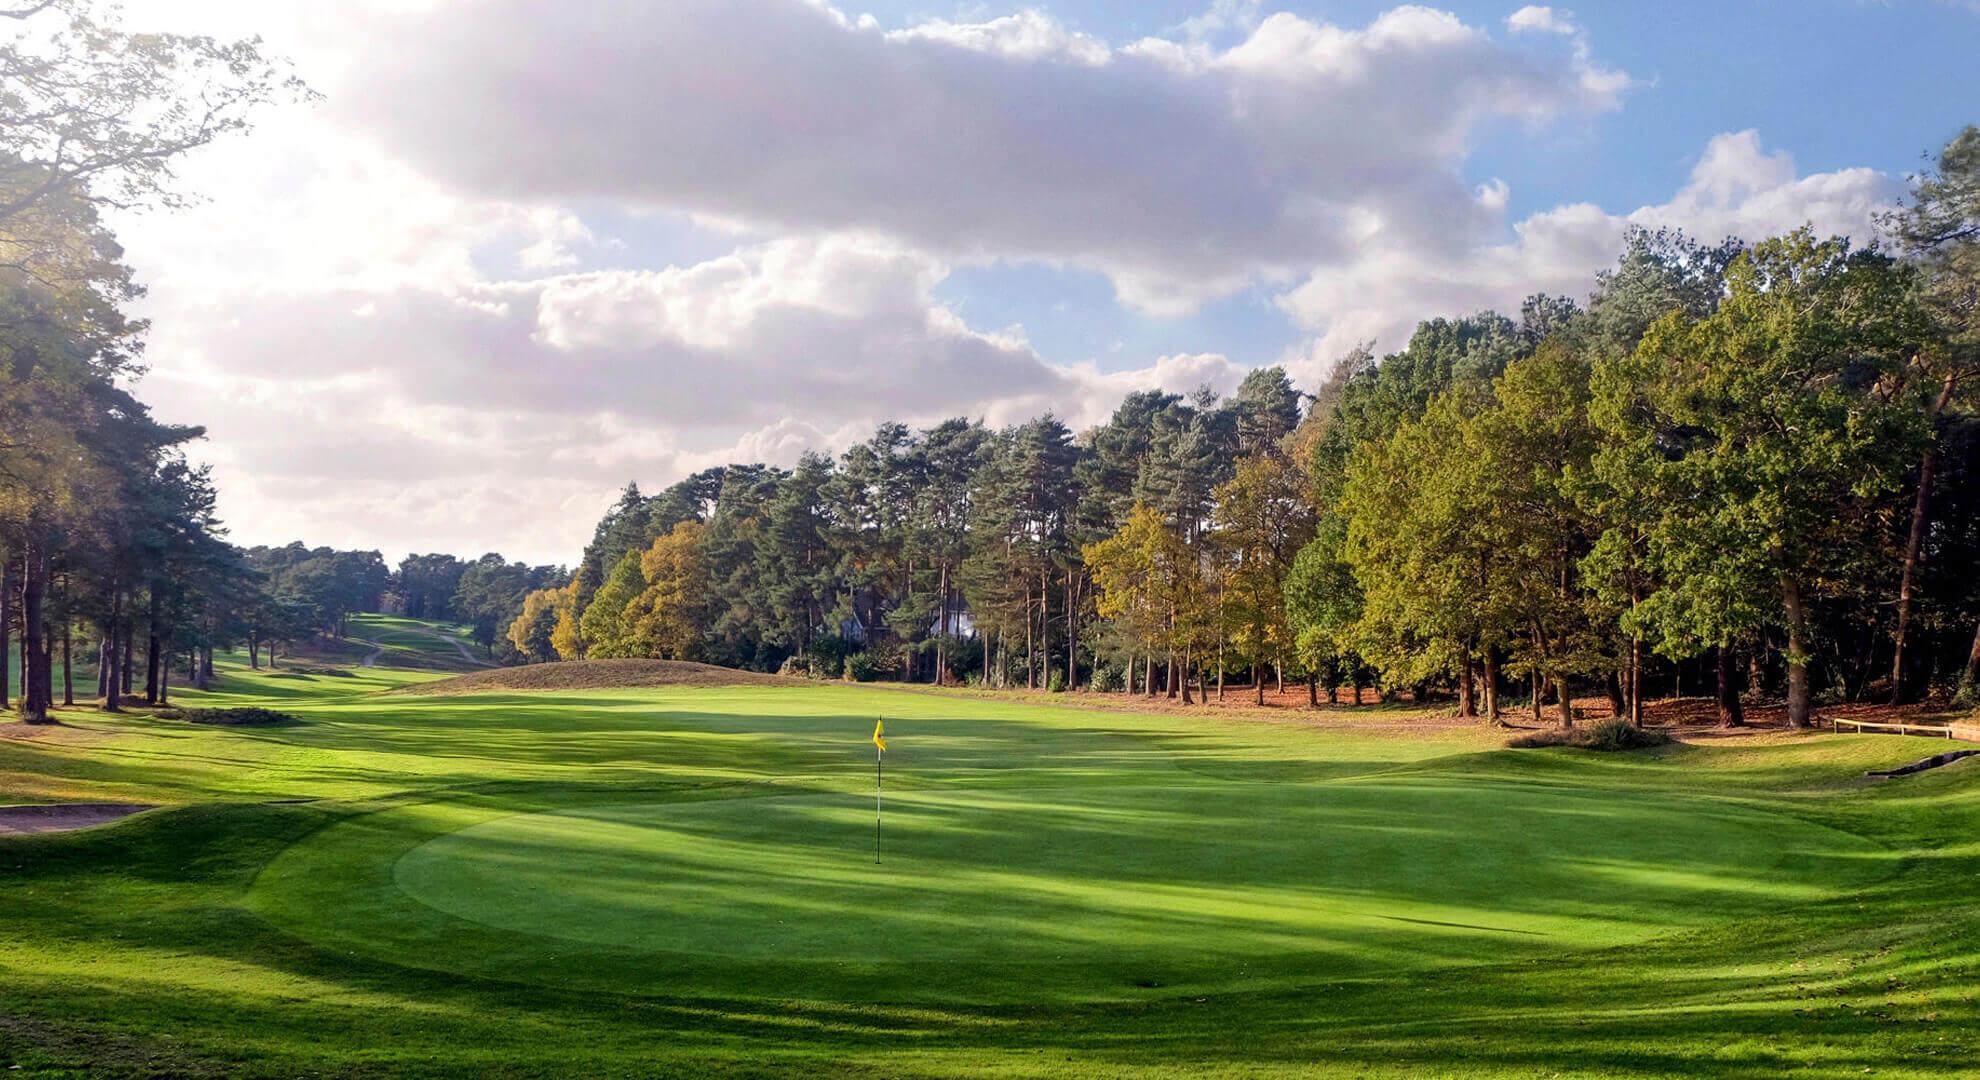 Camberley Heath Golf Course, South East England